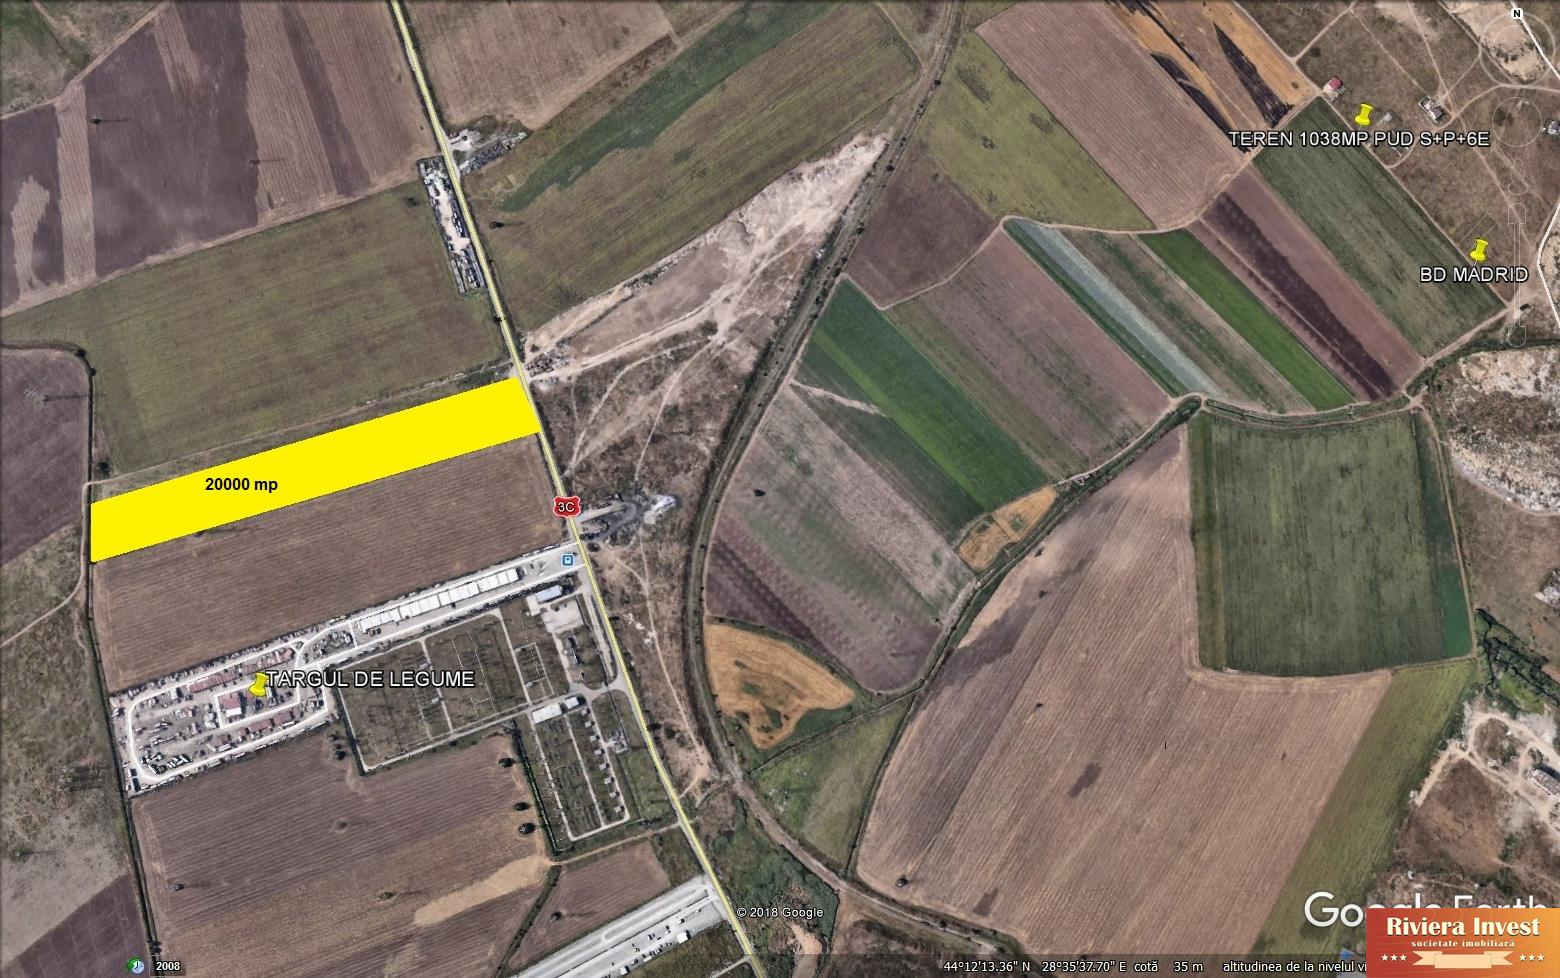 Varianta Ovidiu Targul de legume –teren 20000 mp, ideal investitie